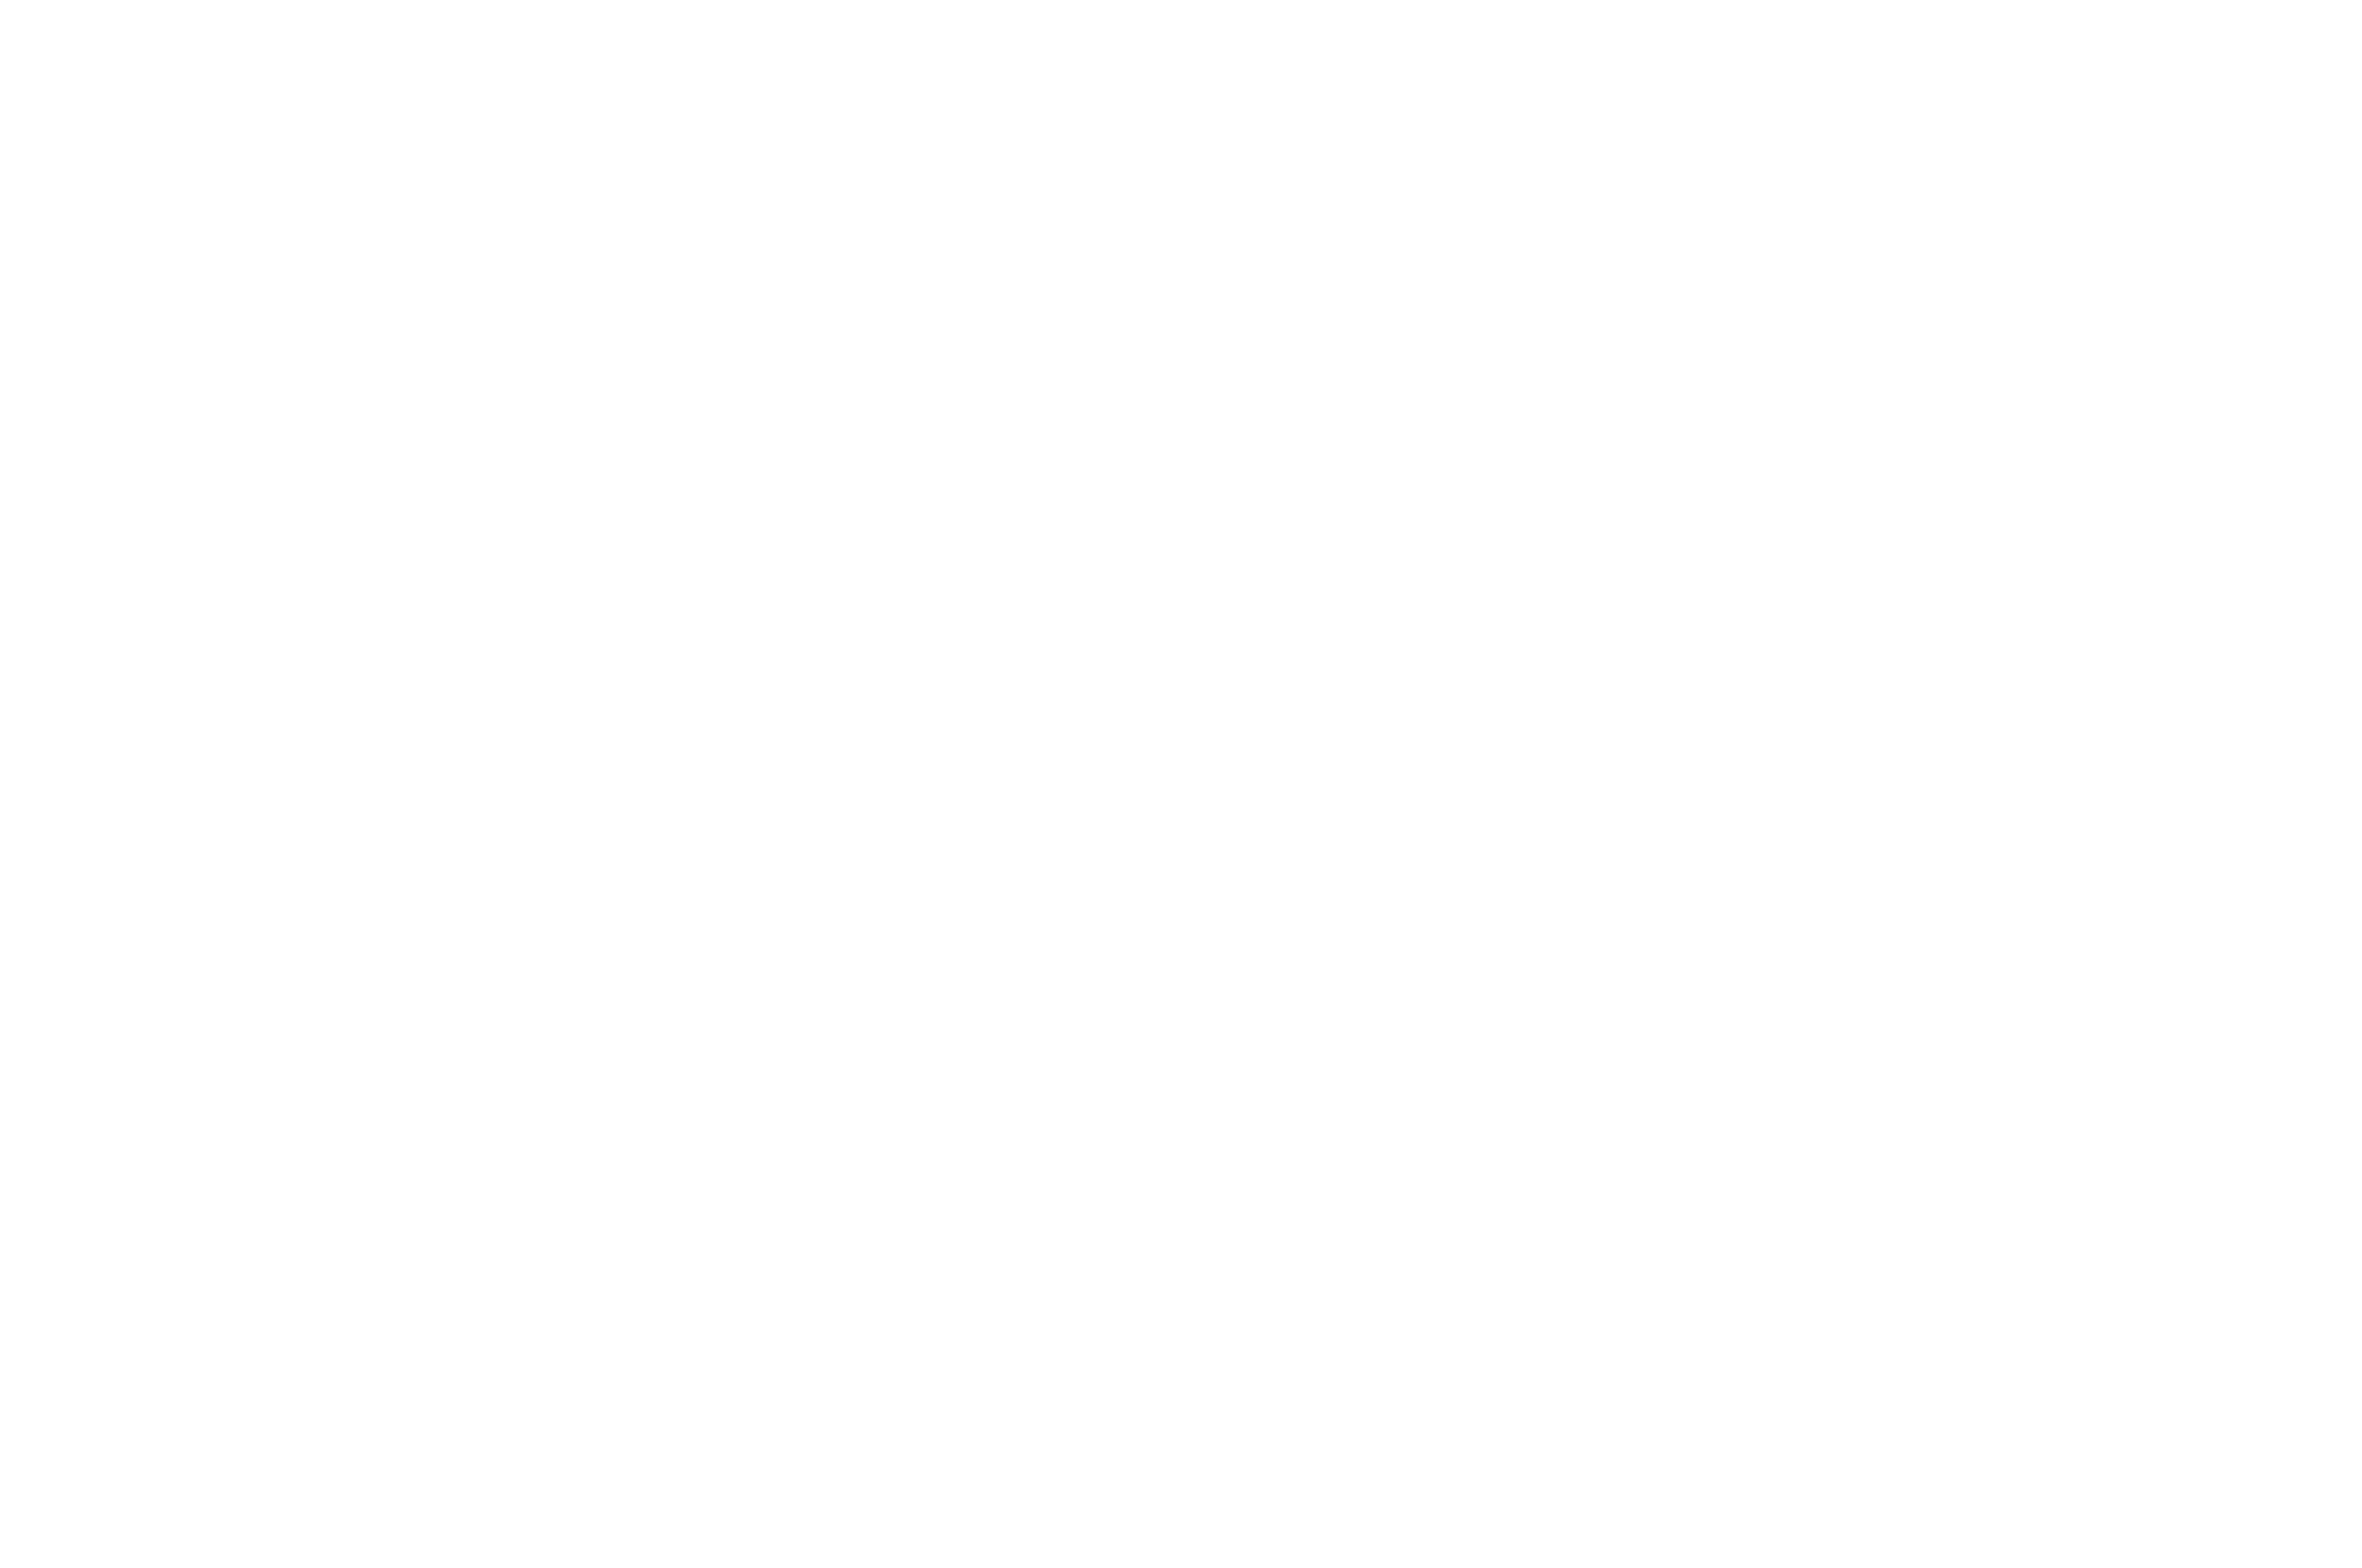 Best International Screenplay Summer in the South Film Festival